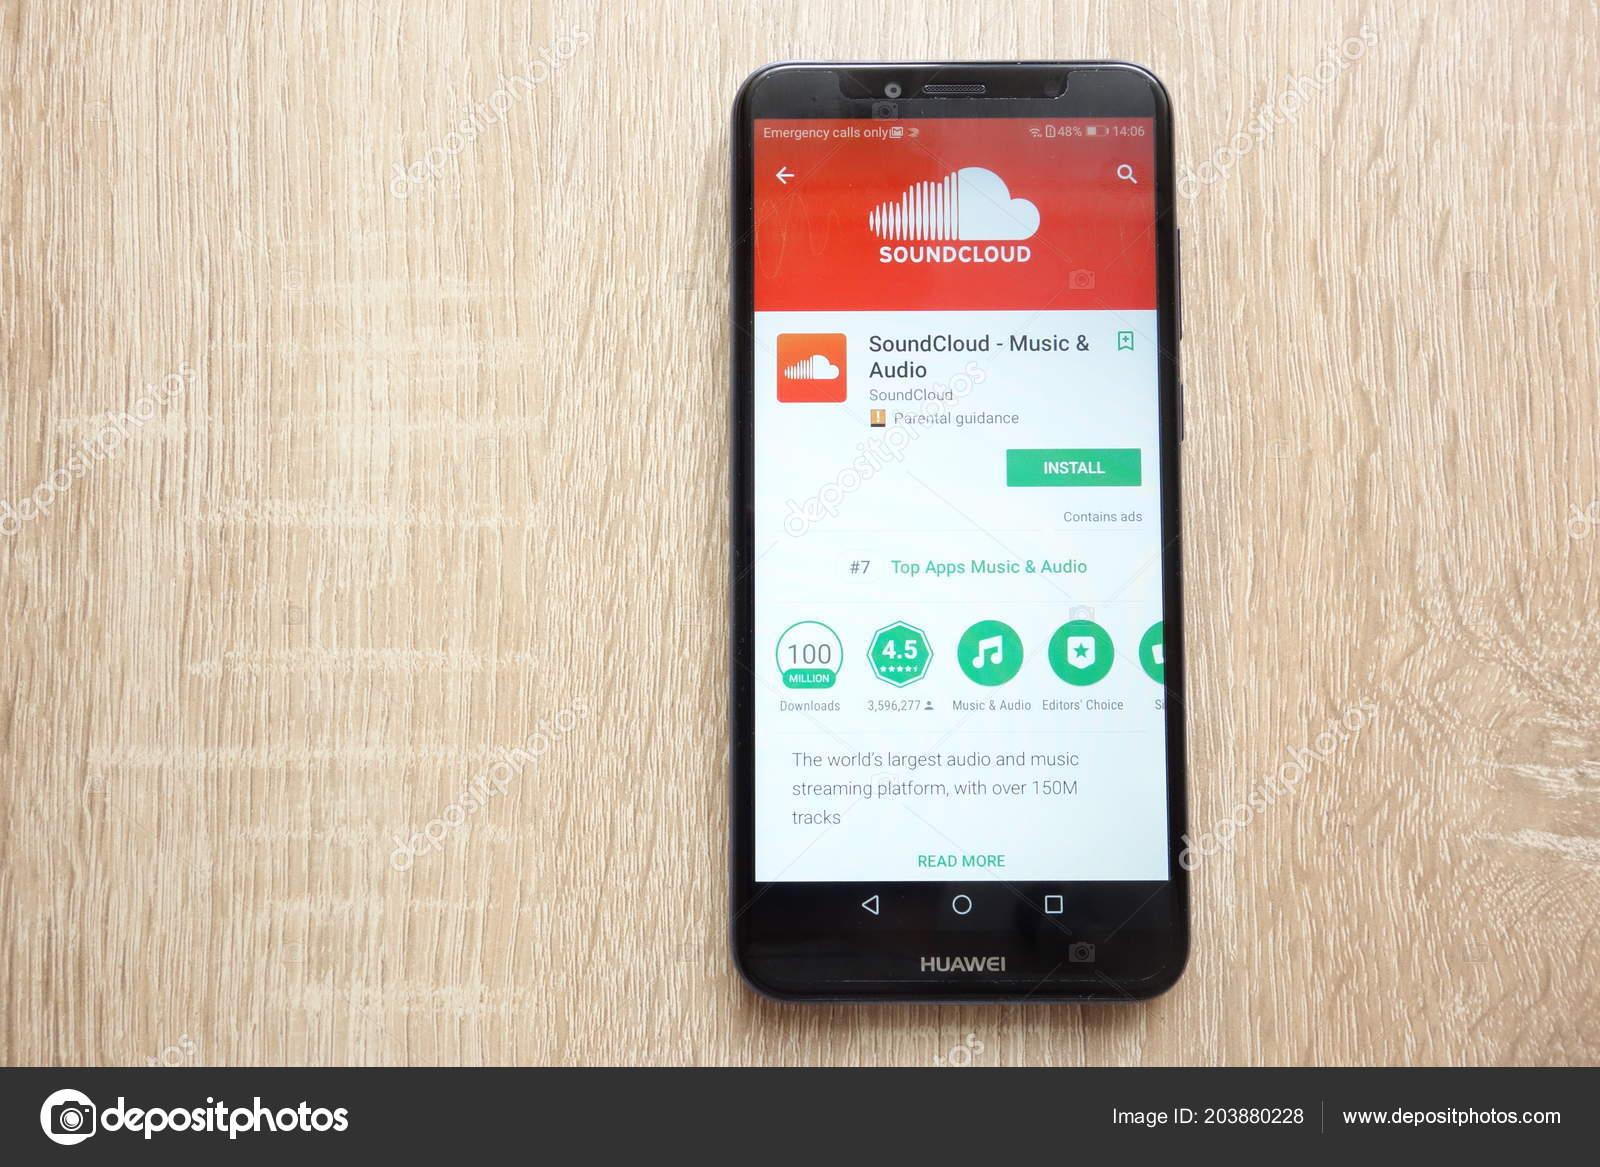 Konskie Poland June 2018 Soundcloud App Google Play Store